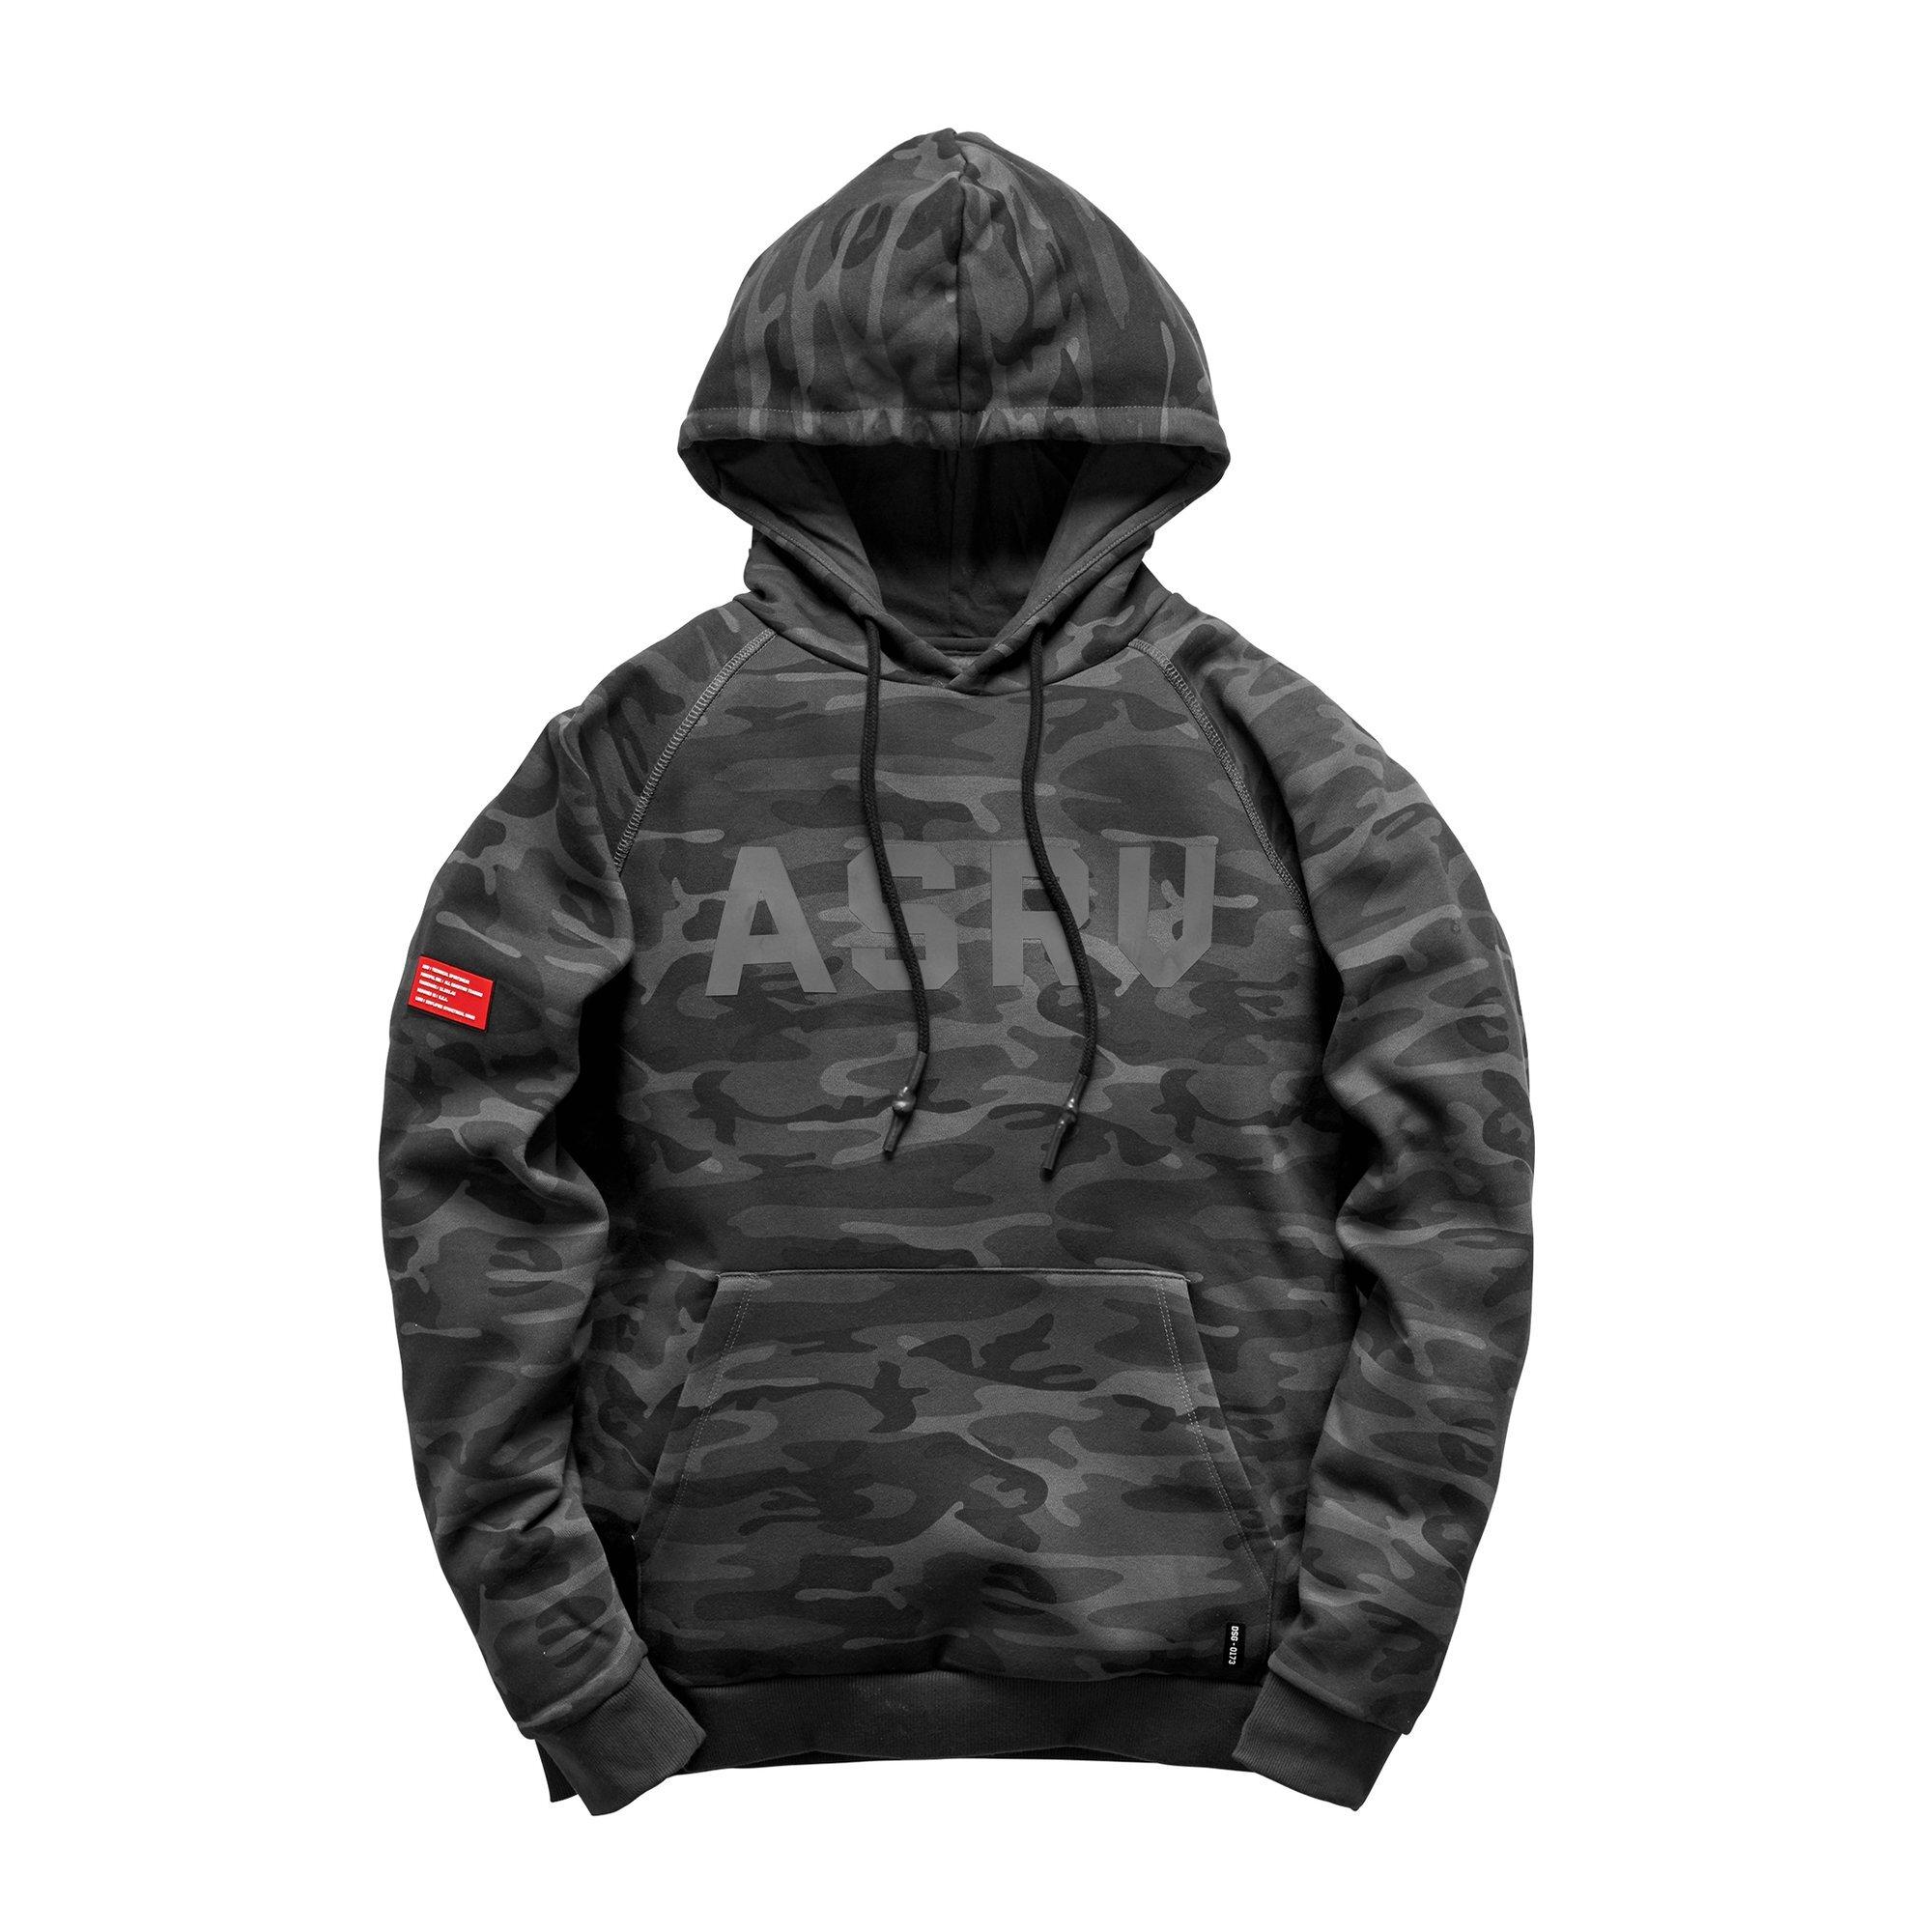 【ASRV】RainPlus™エッセンシャルフリースフーディー - Black Camo